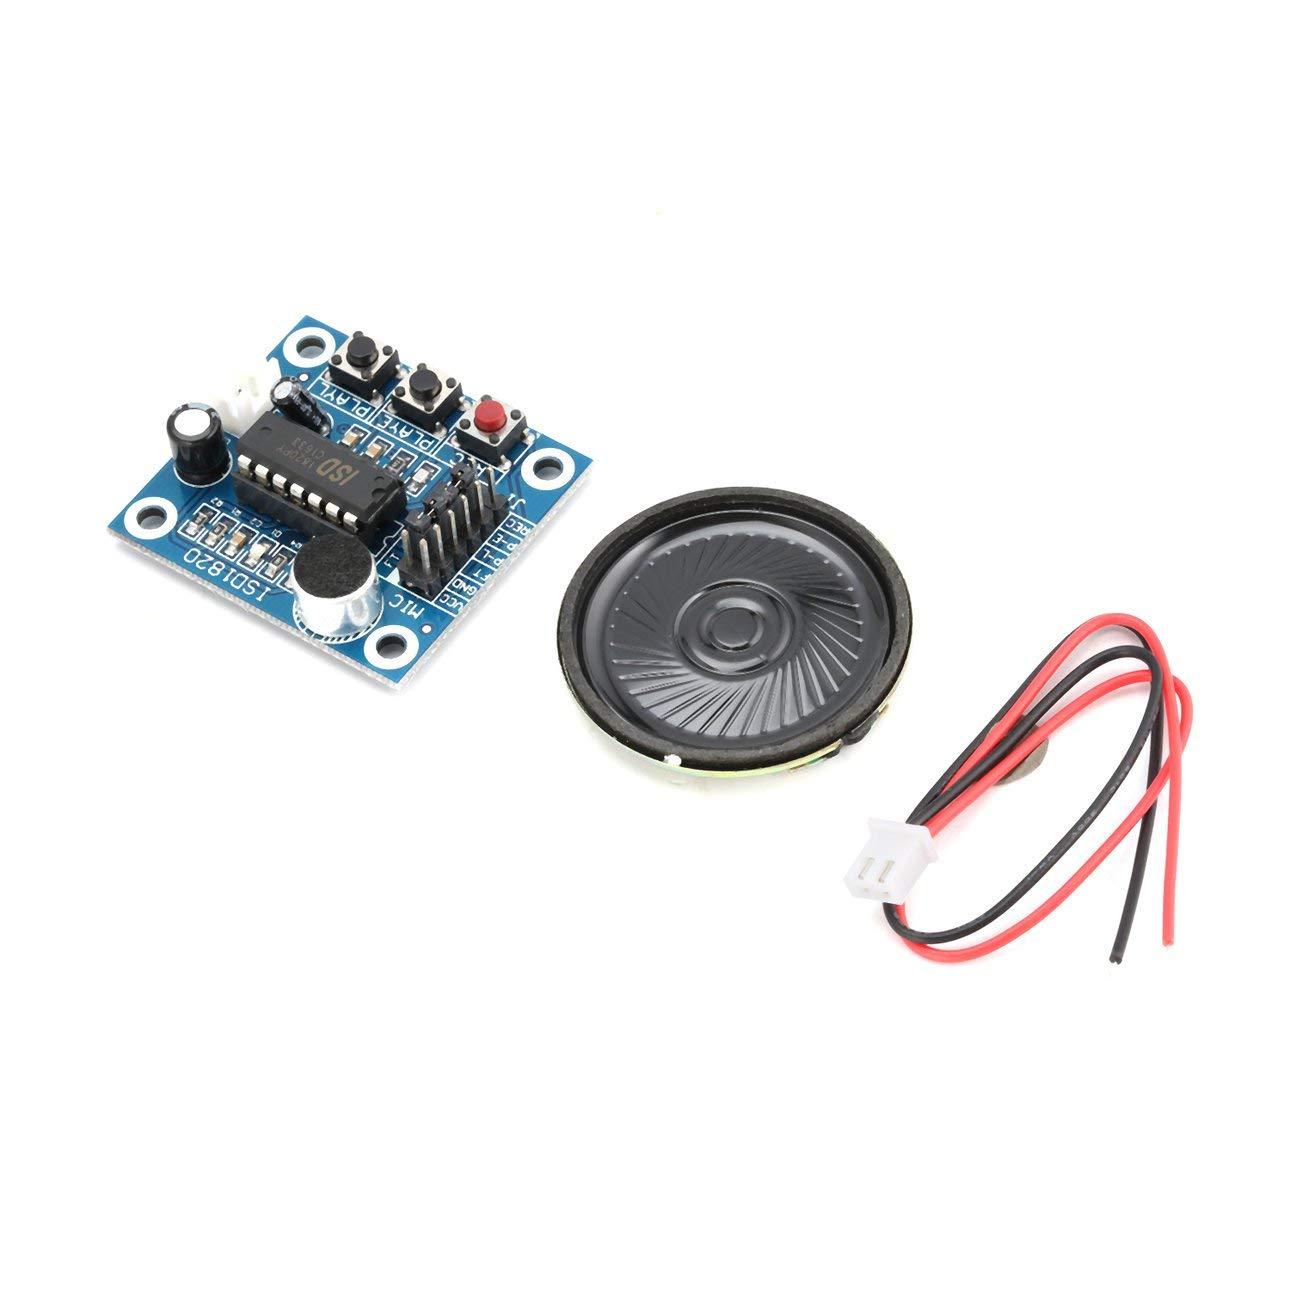 Liobaba ISD1820 10s Mic Voice Sound Playback Board Recording Recorder Module Kit Microphone Audio Speaker Loudspeaker for Arduino